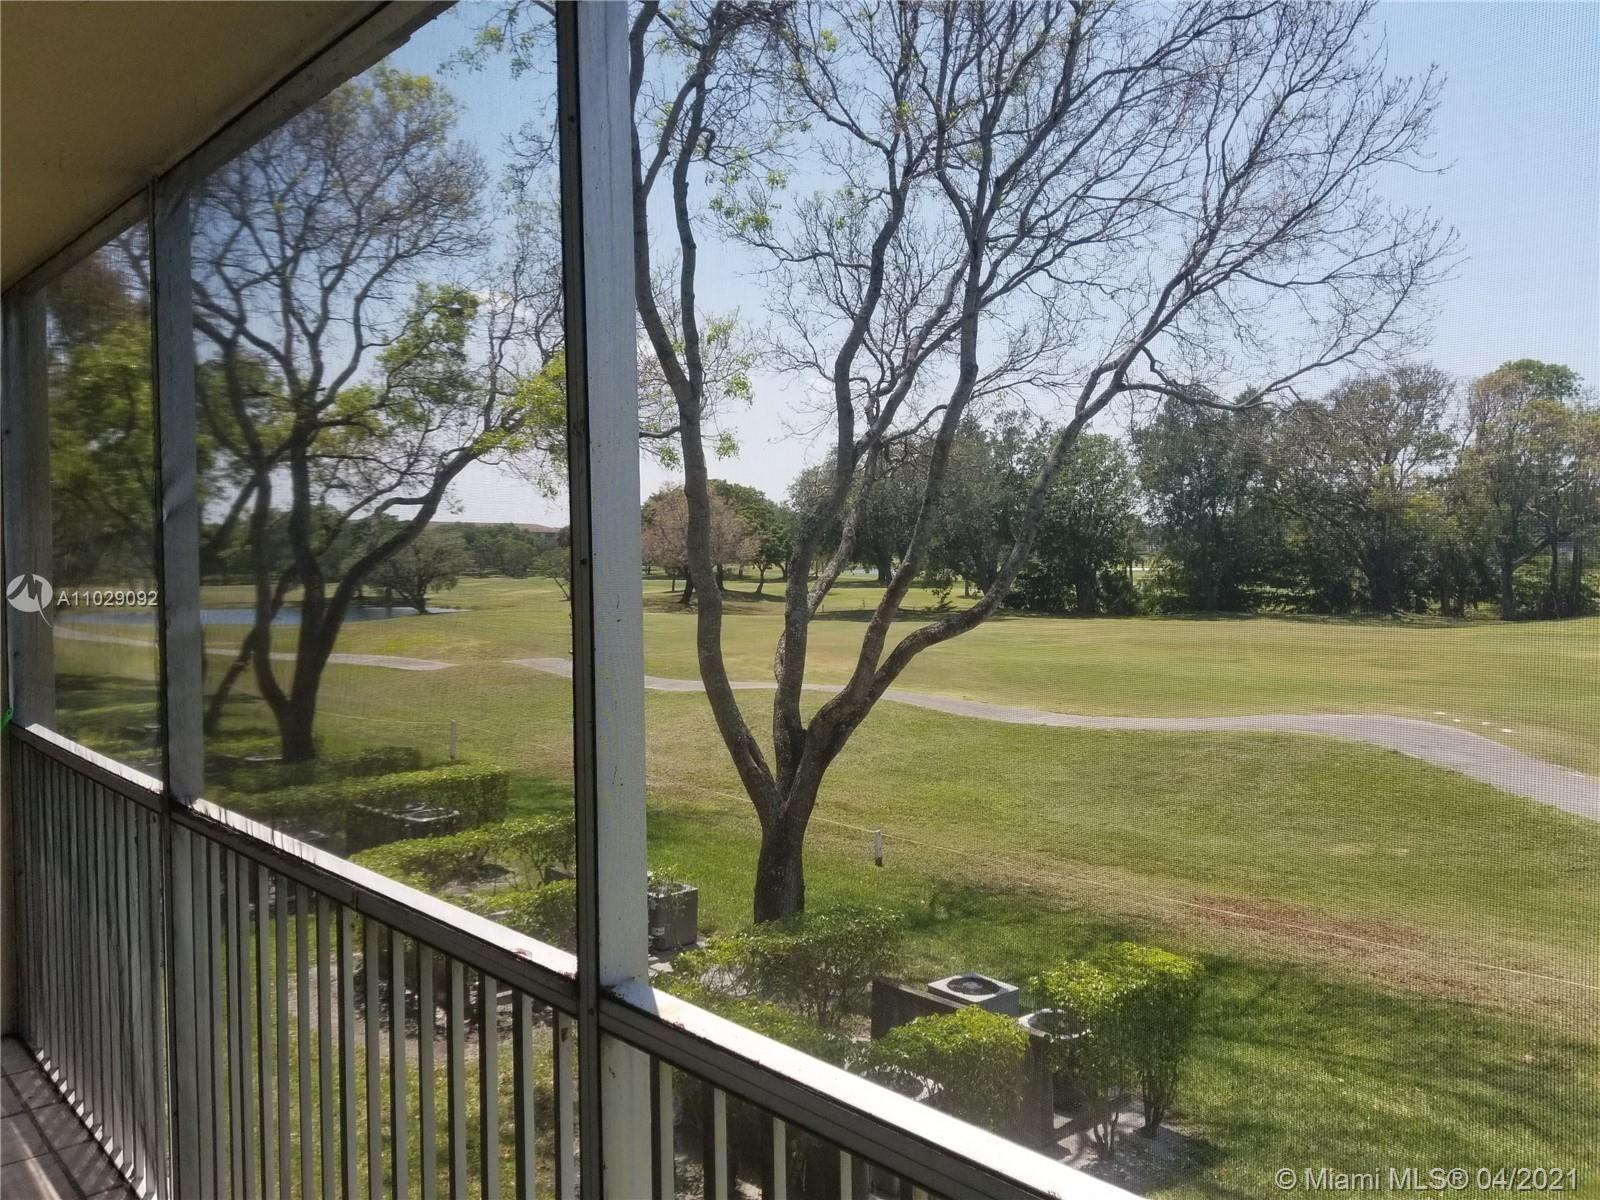 Photo of 400 SW 134th Way #213F, Pembroke Pines, FL 33027 (MLS # A11029092)